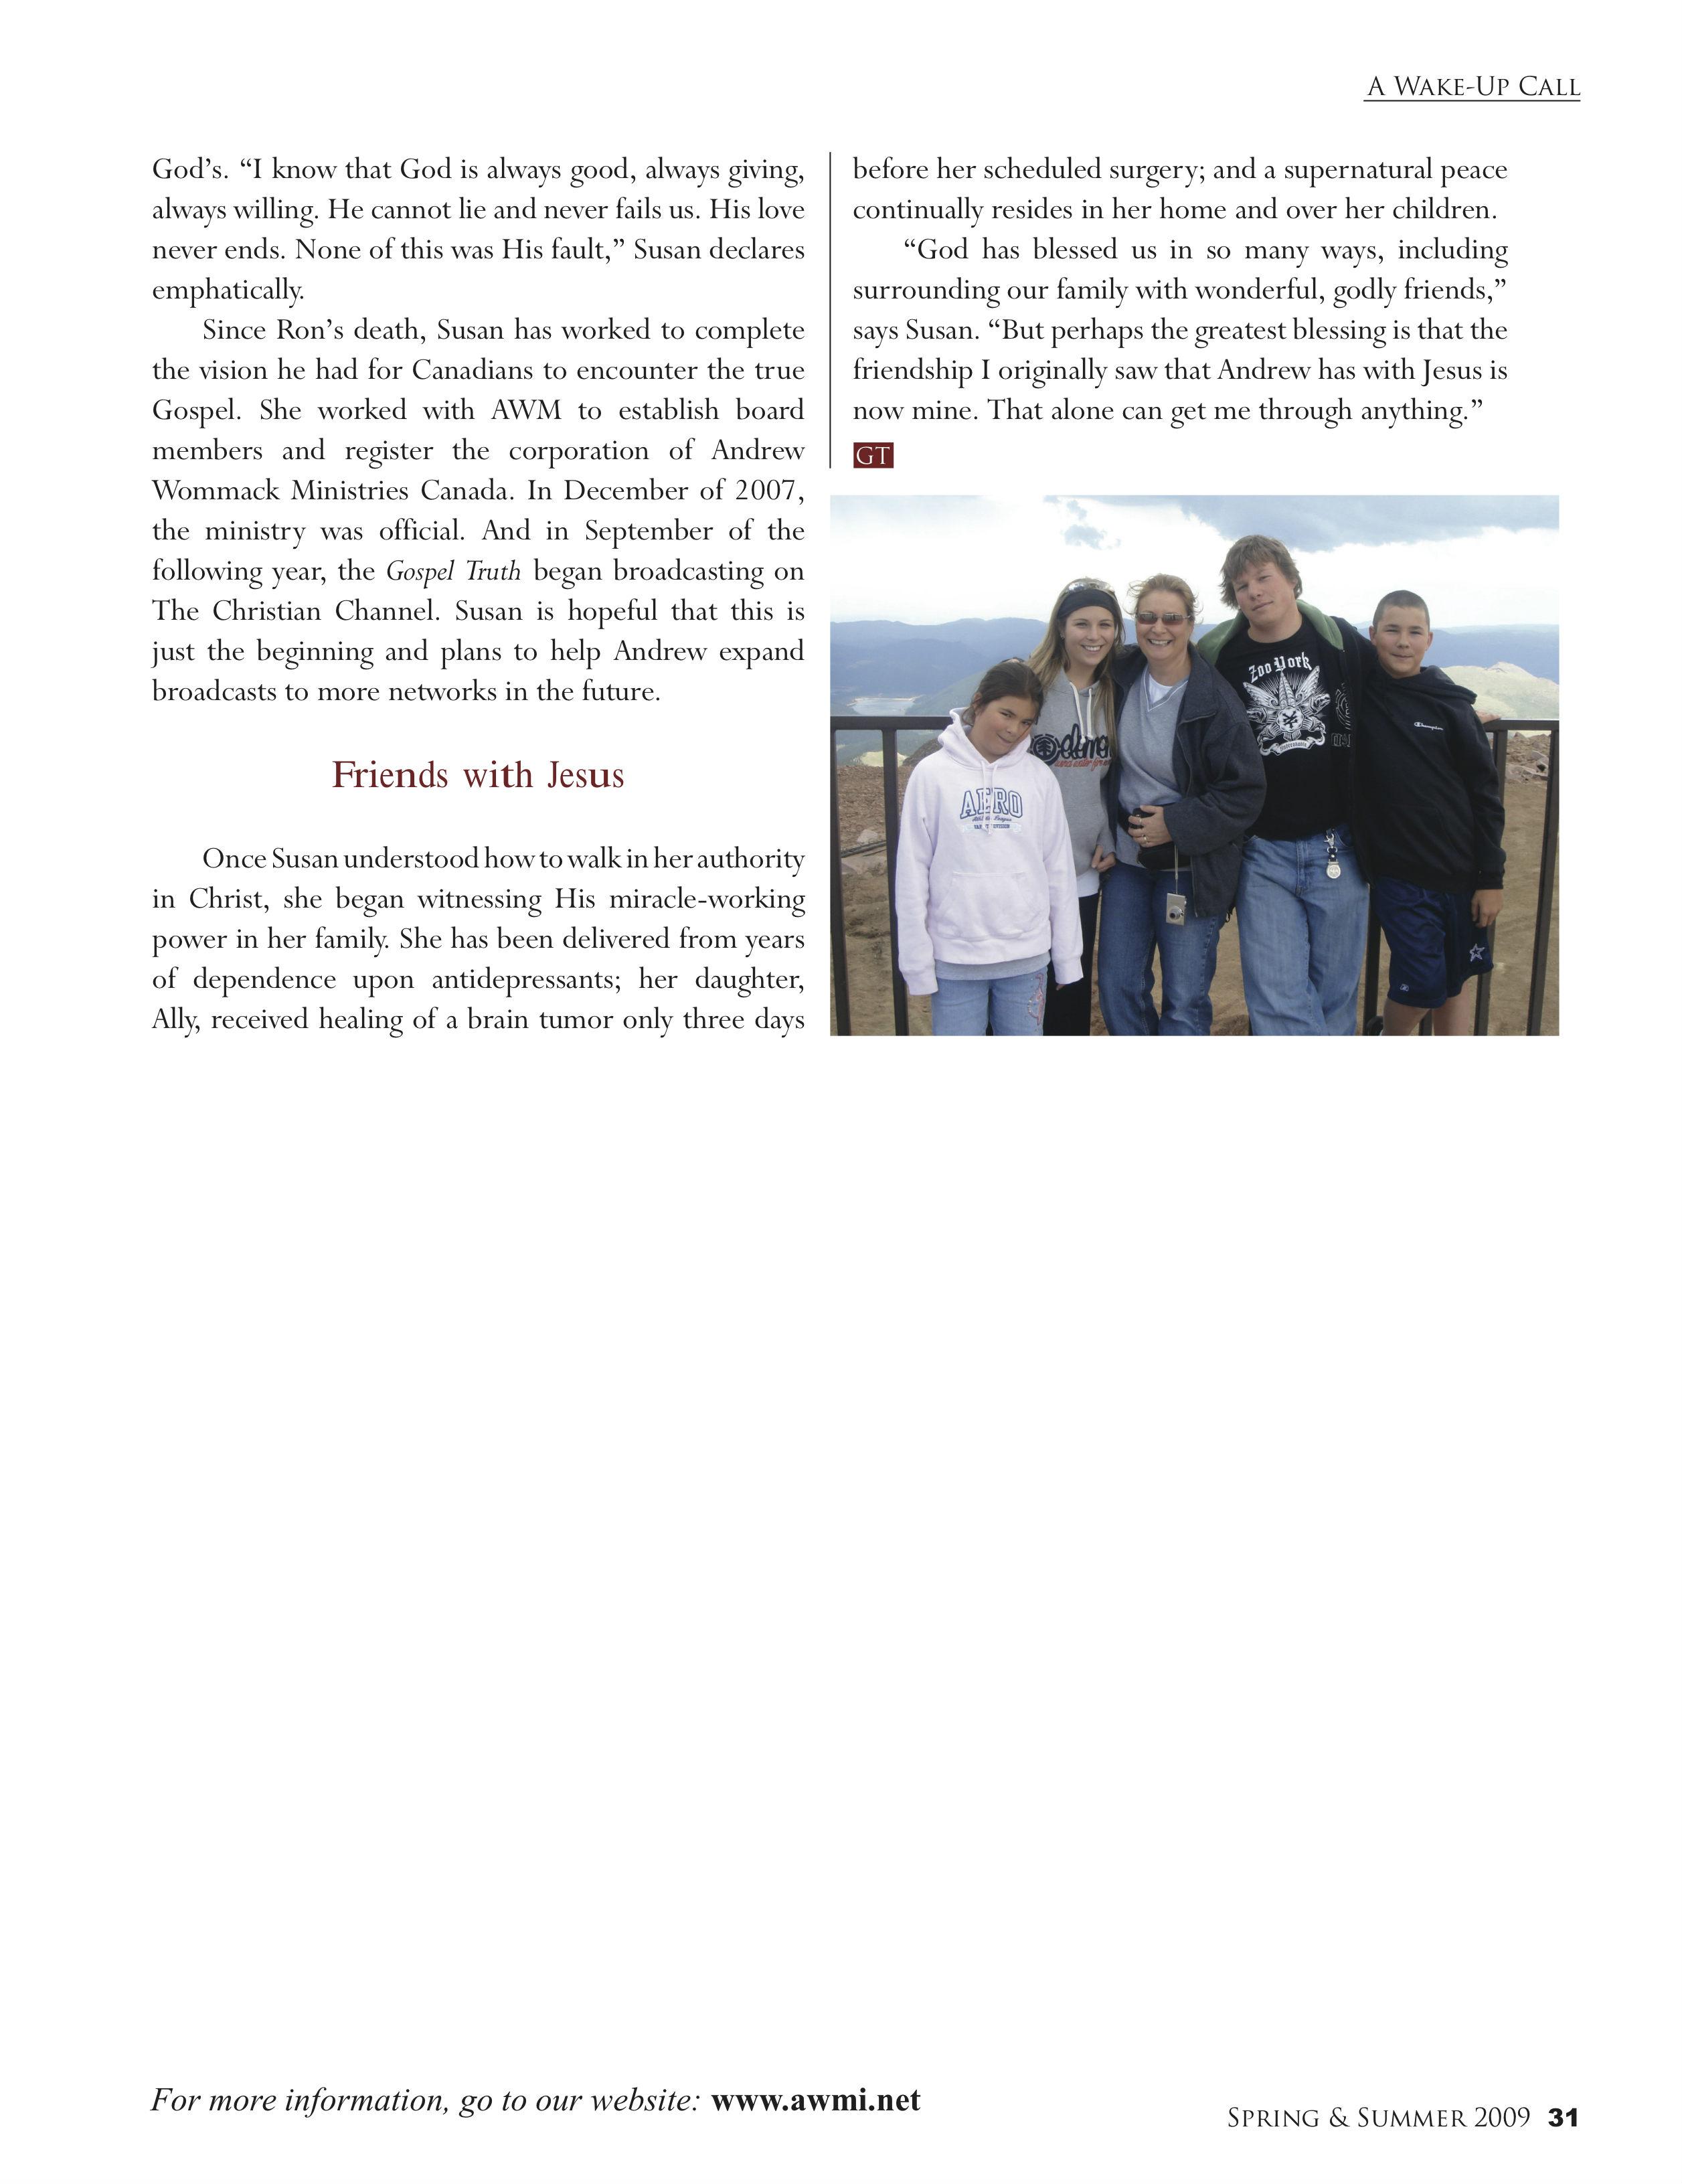 A Wake Up Call | Gospel Truth Magazine Spring/Summer 2009 | P 31